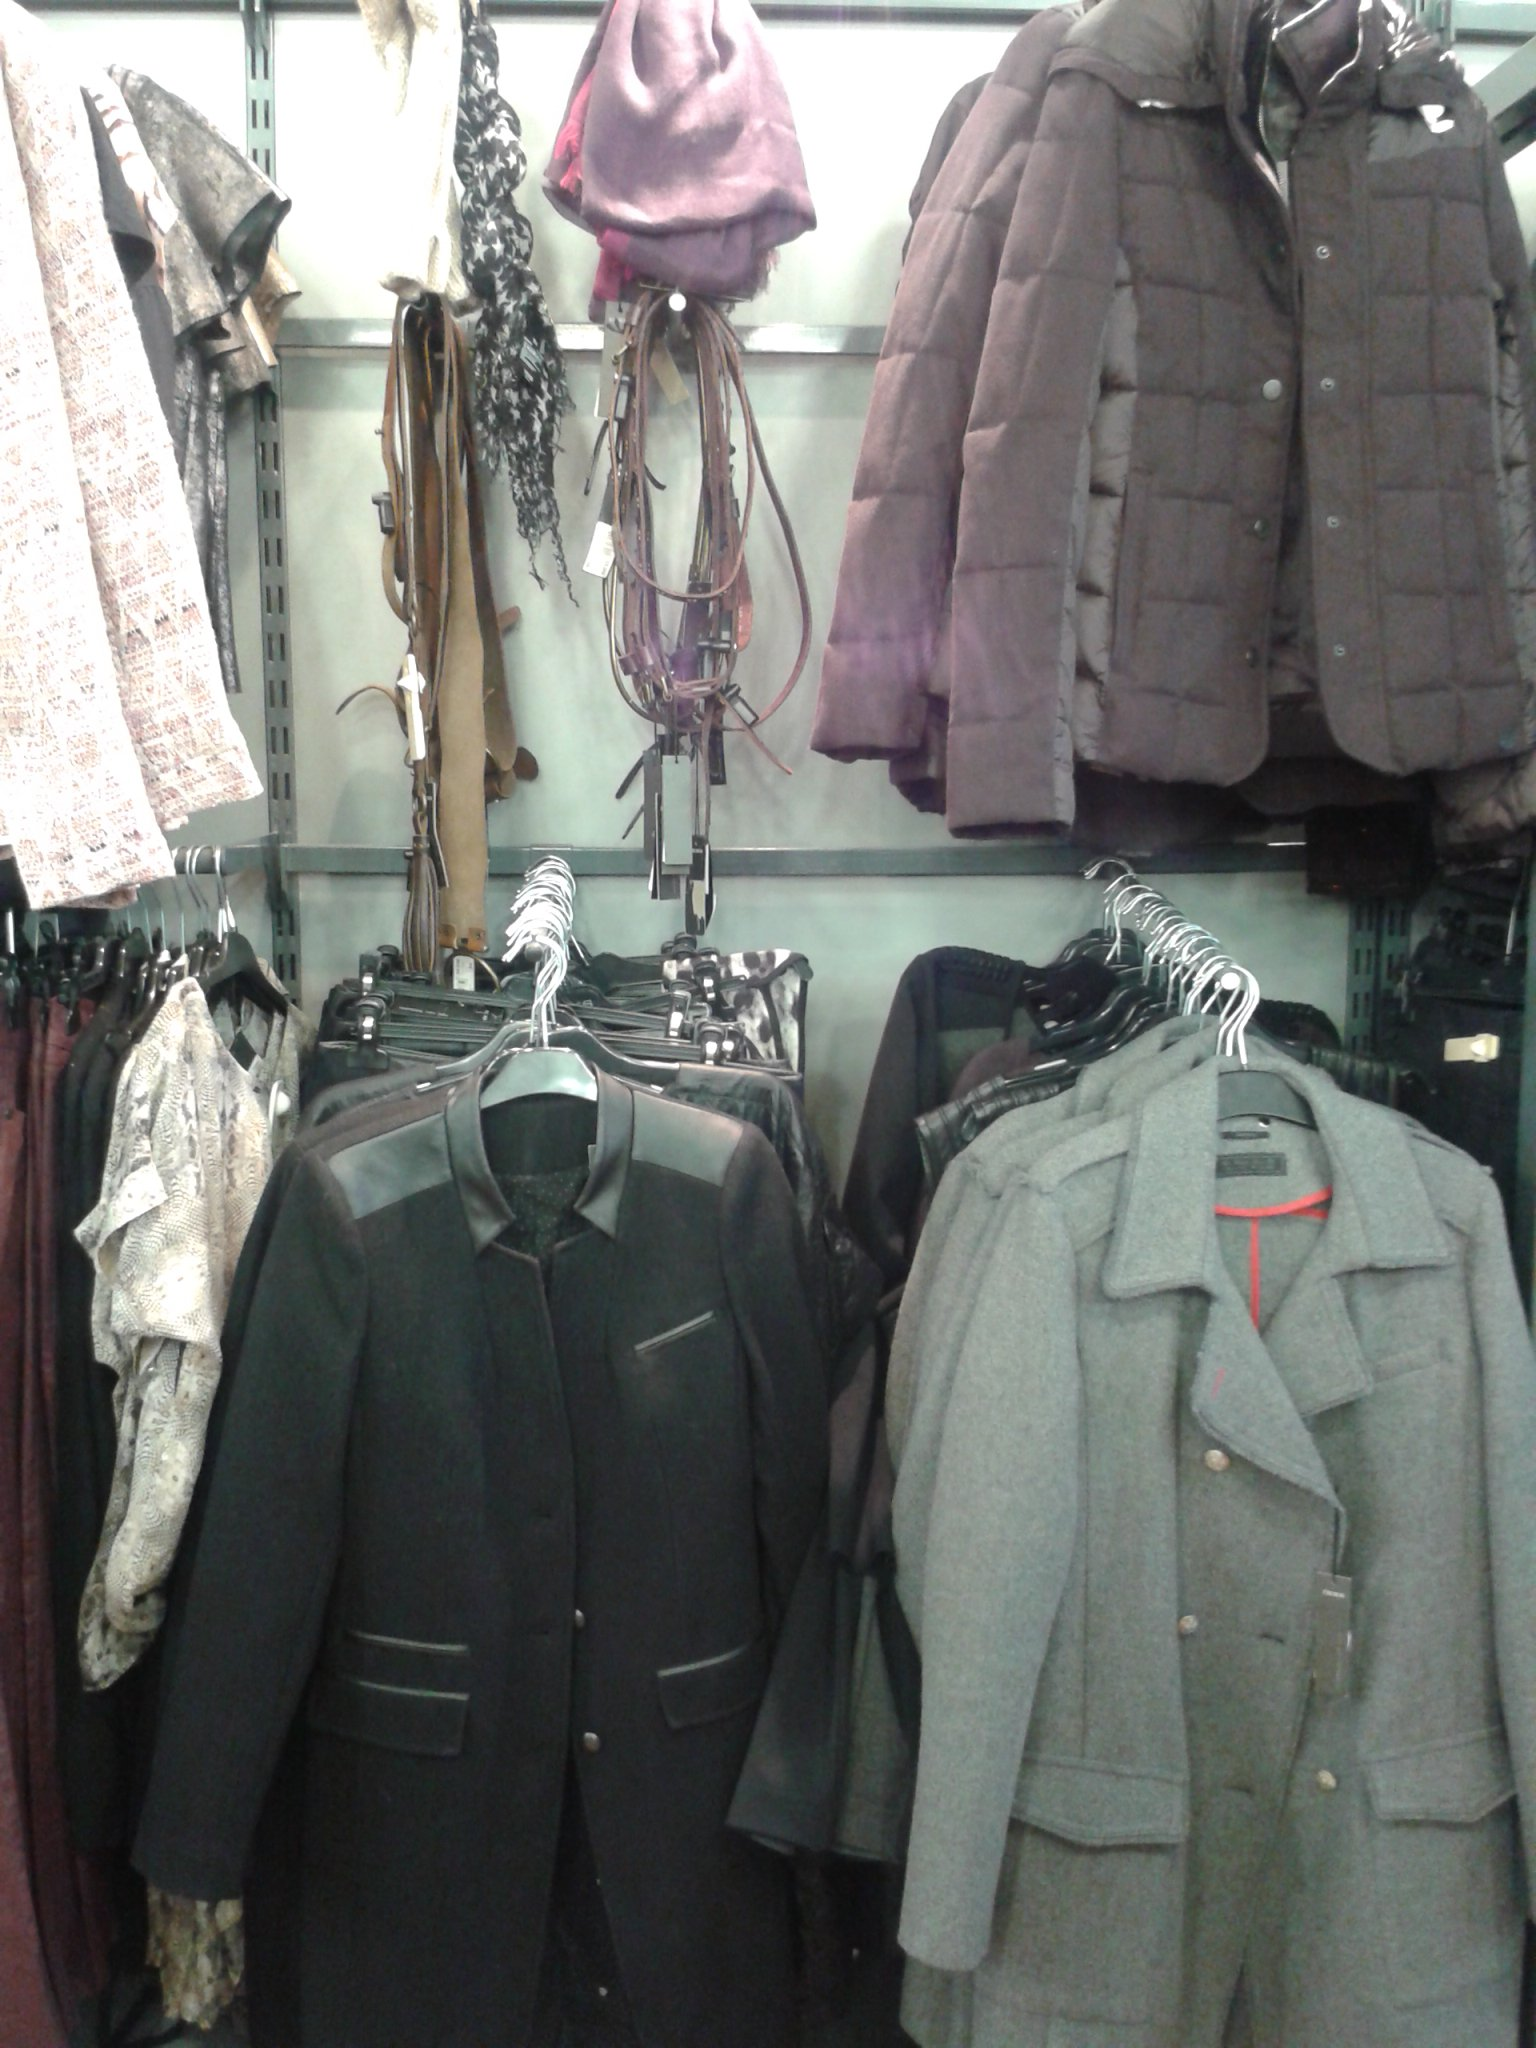 Ikks outlet general store magasin d 39 usine - Adresse usine roubaix ...